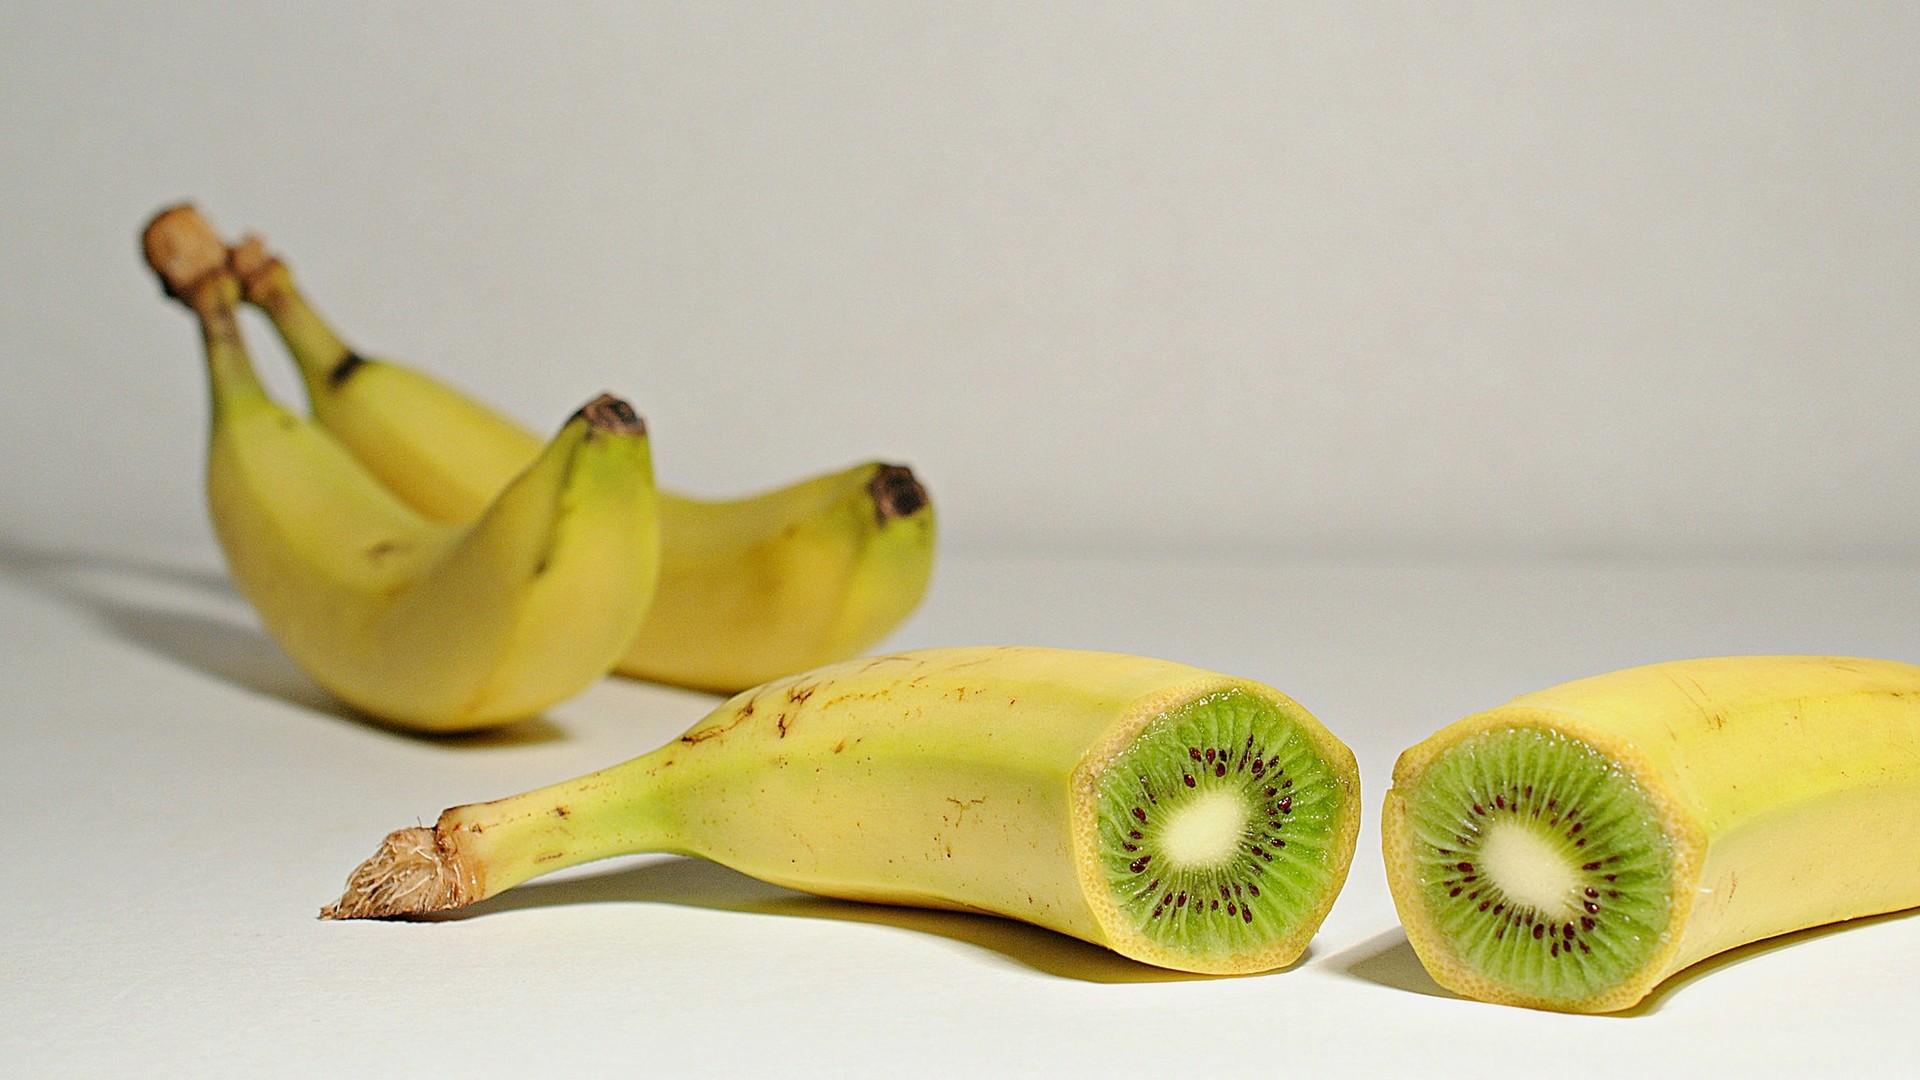 Banana hd wallpaper download